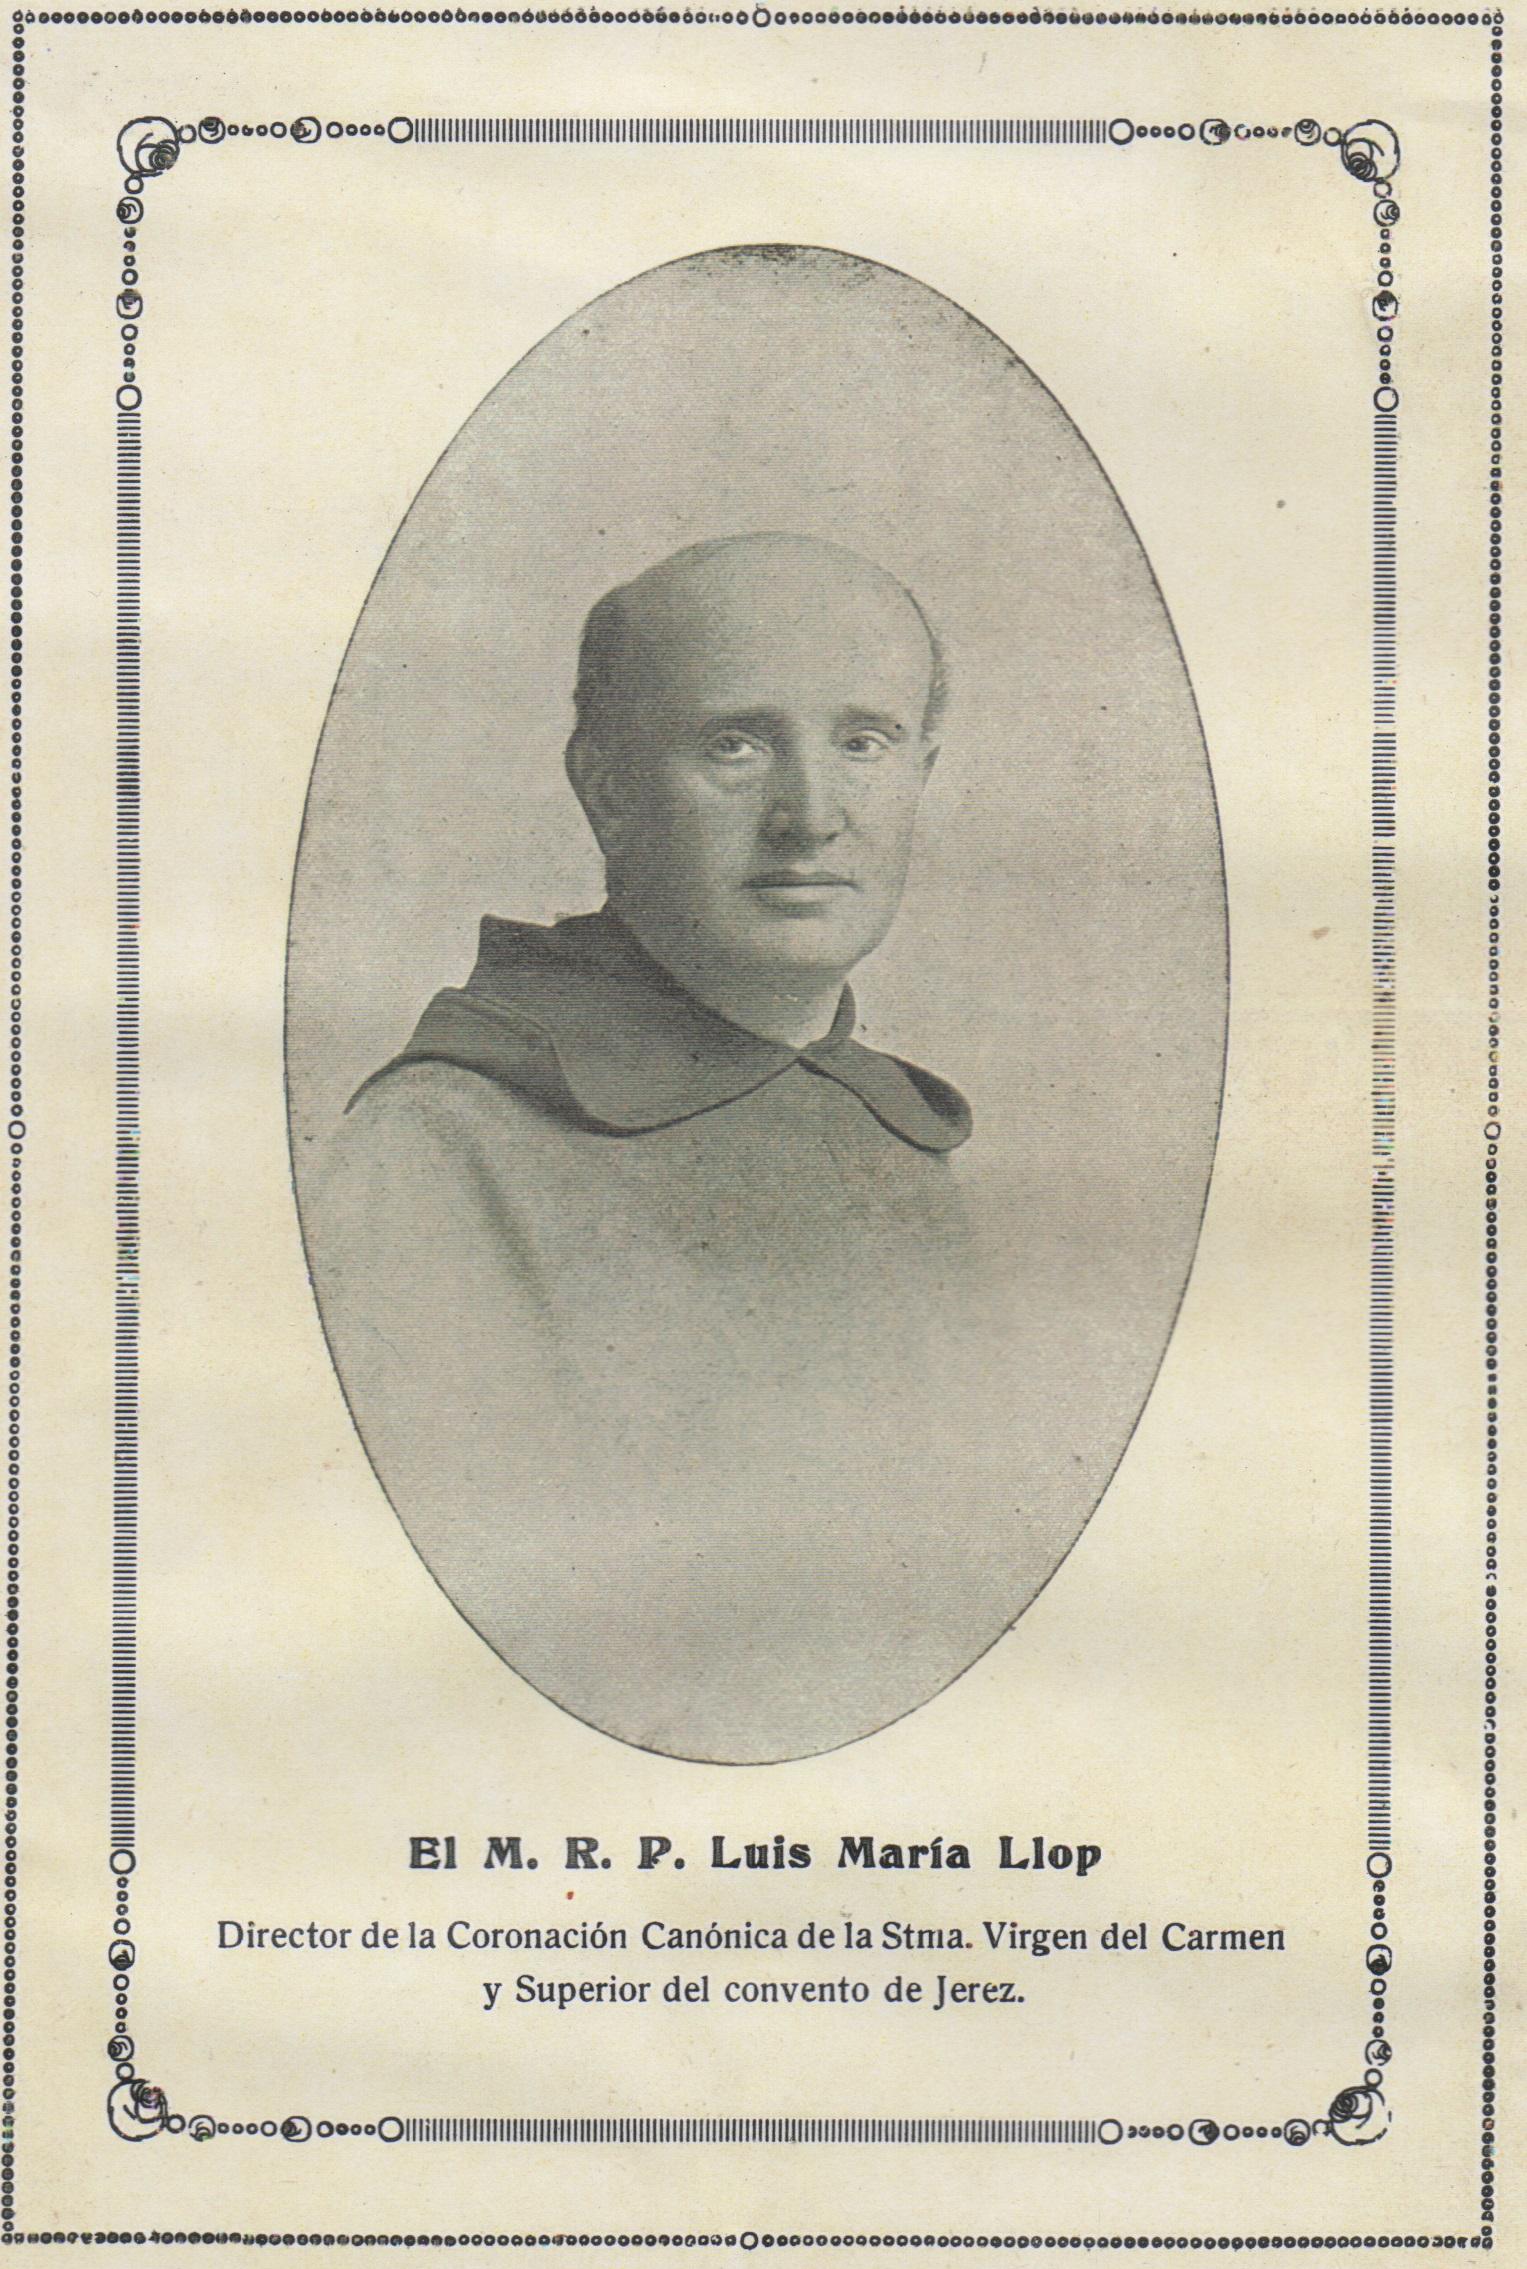 Padre Luis Maria Llop